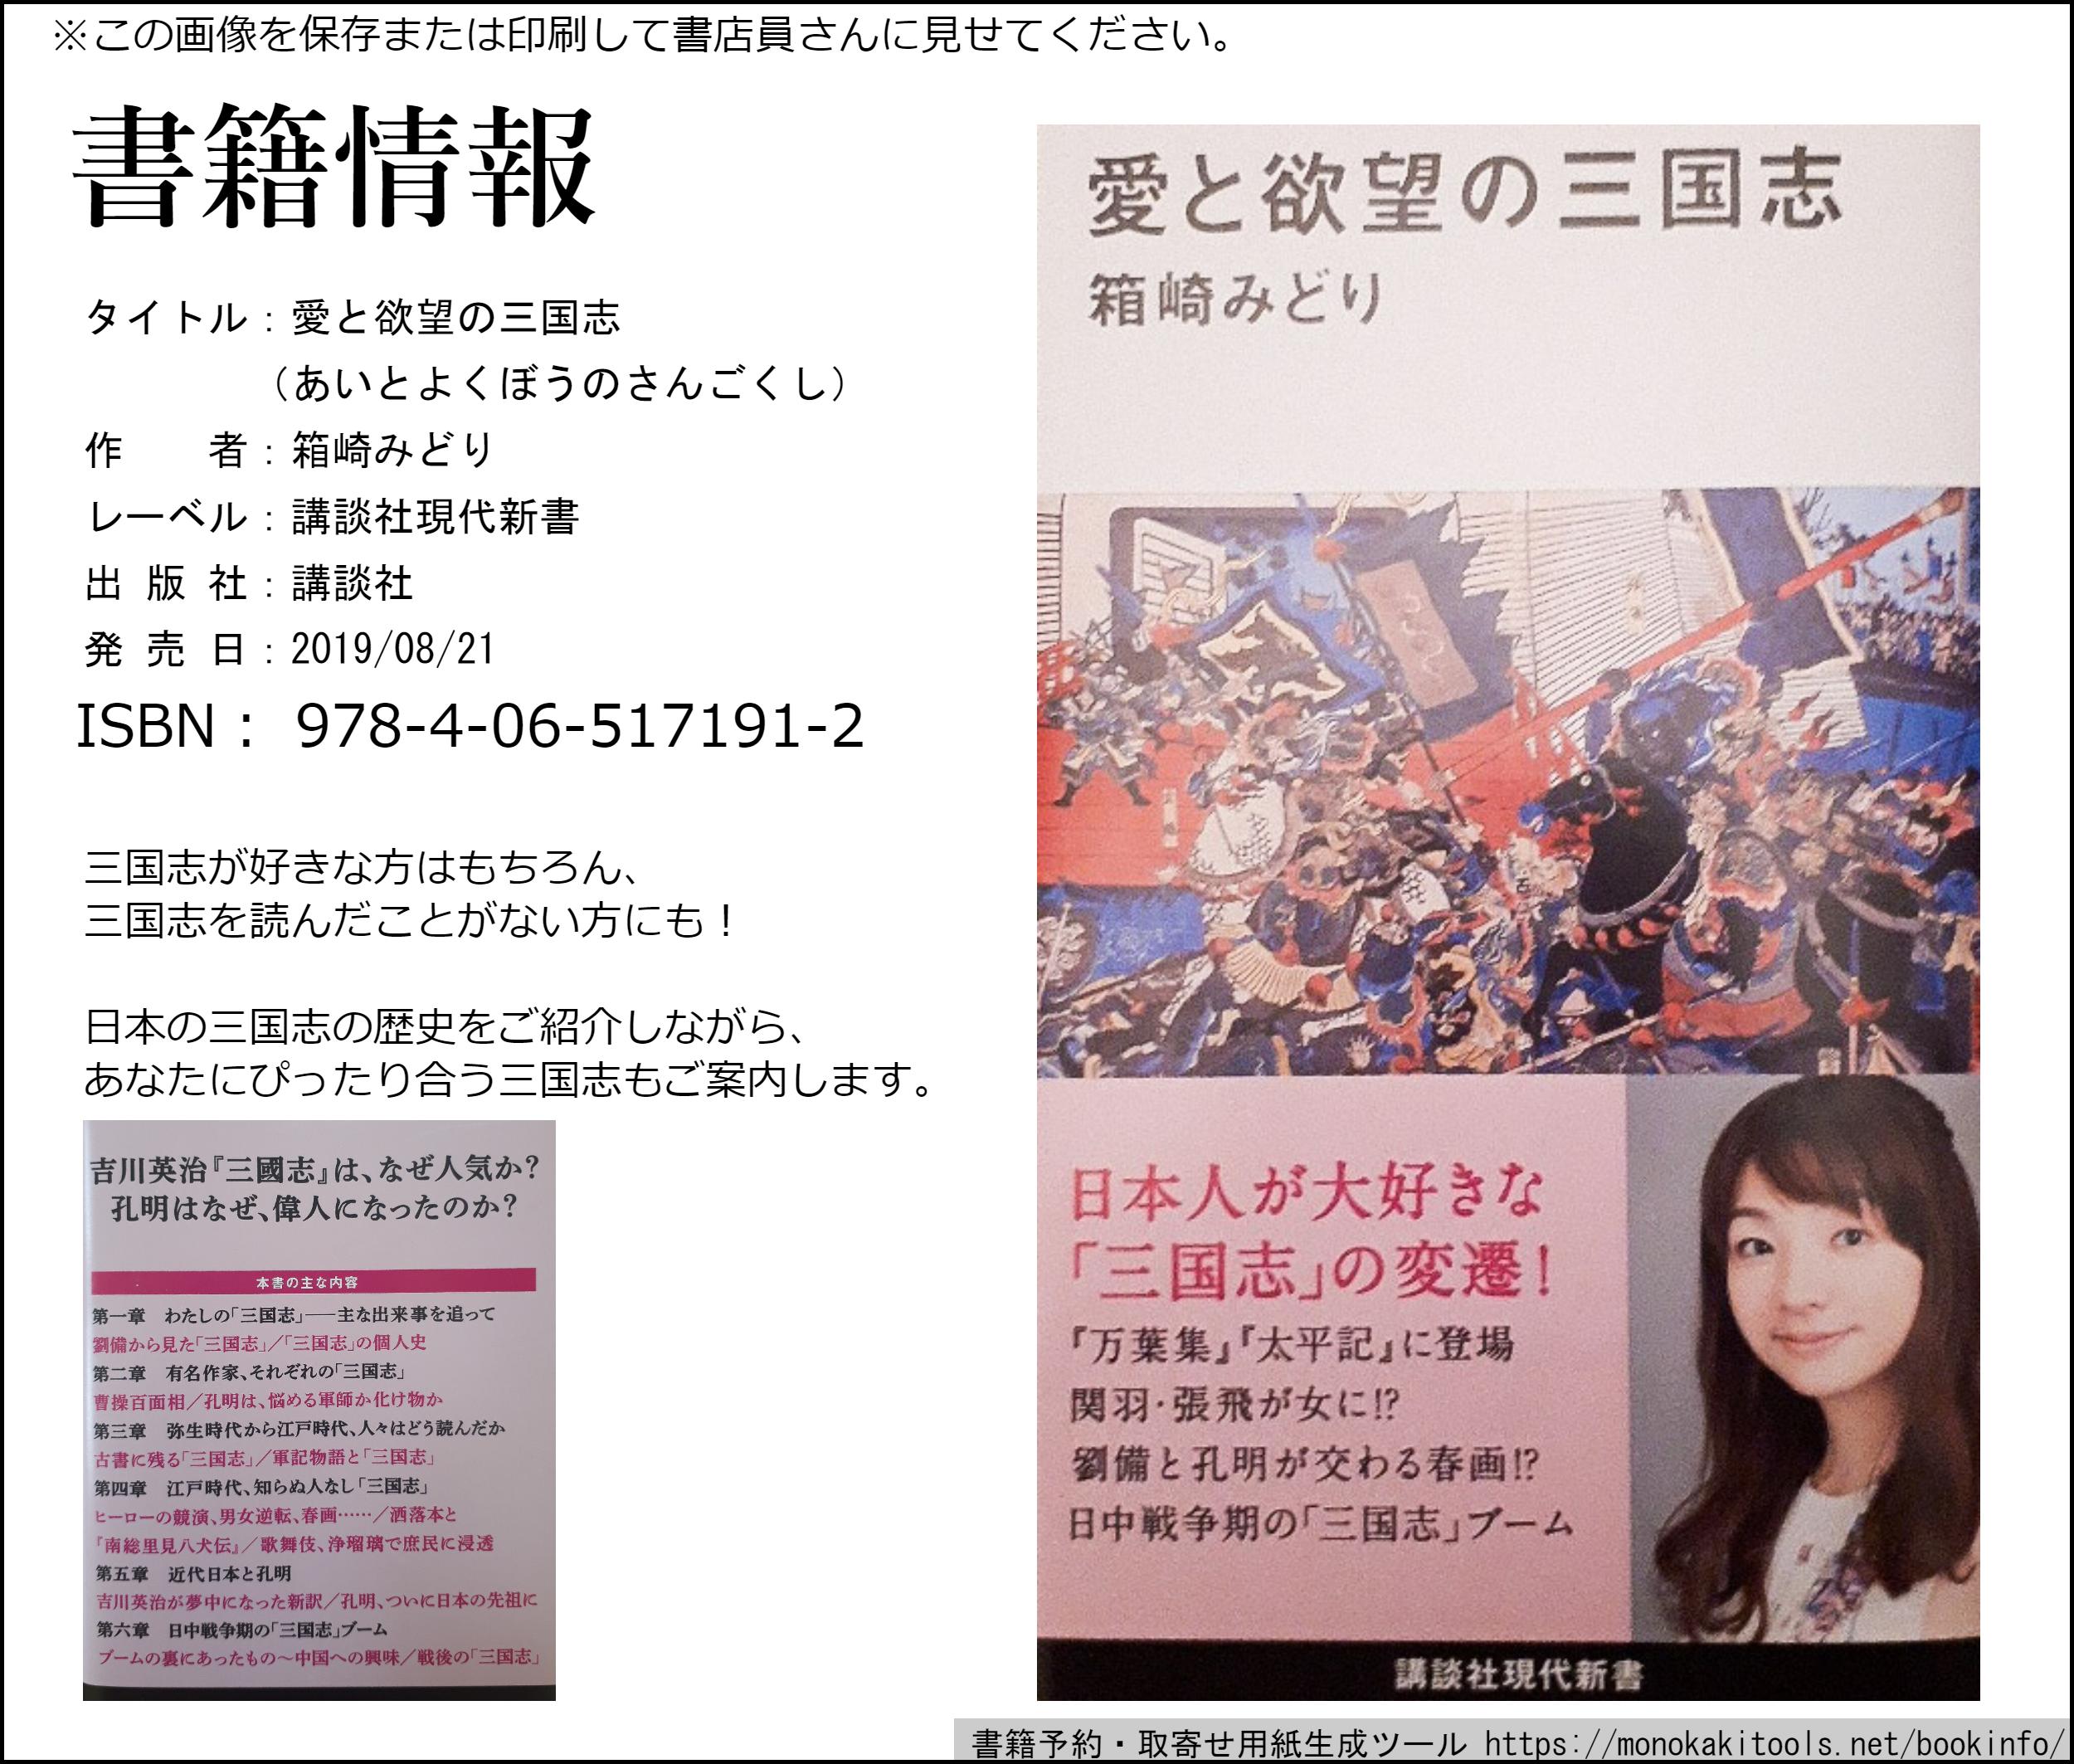 http://www.1242.com/blog/midori/2019/08/21/%E6%9B%B8%E5%BA%97%E7%94%A8.png